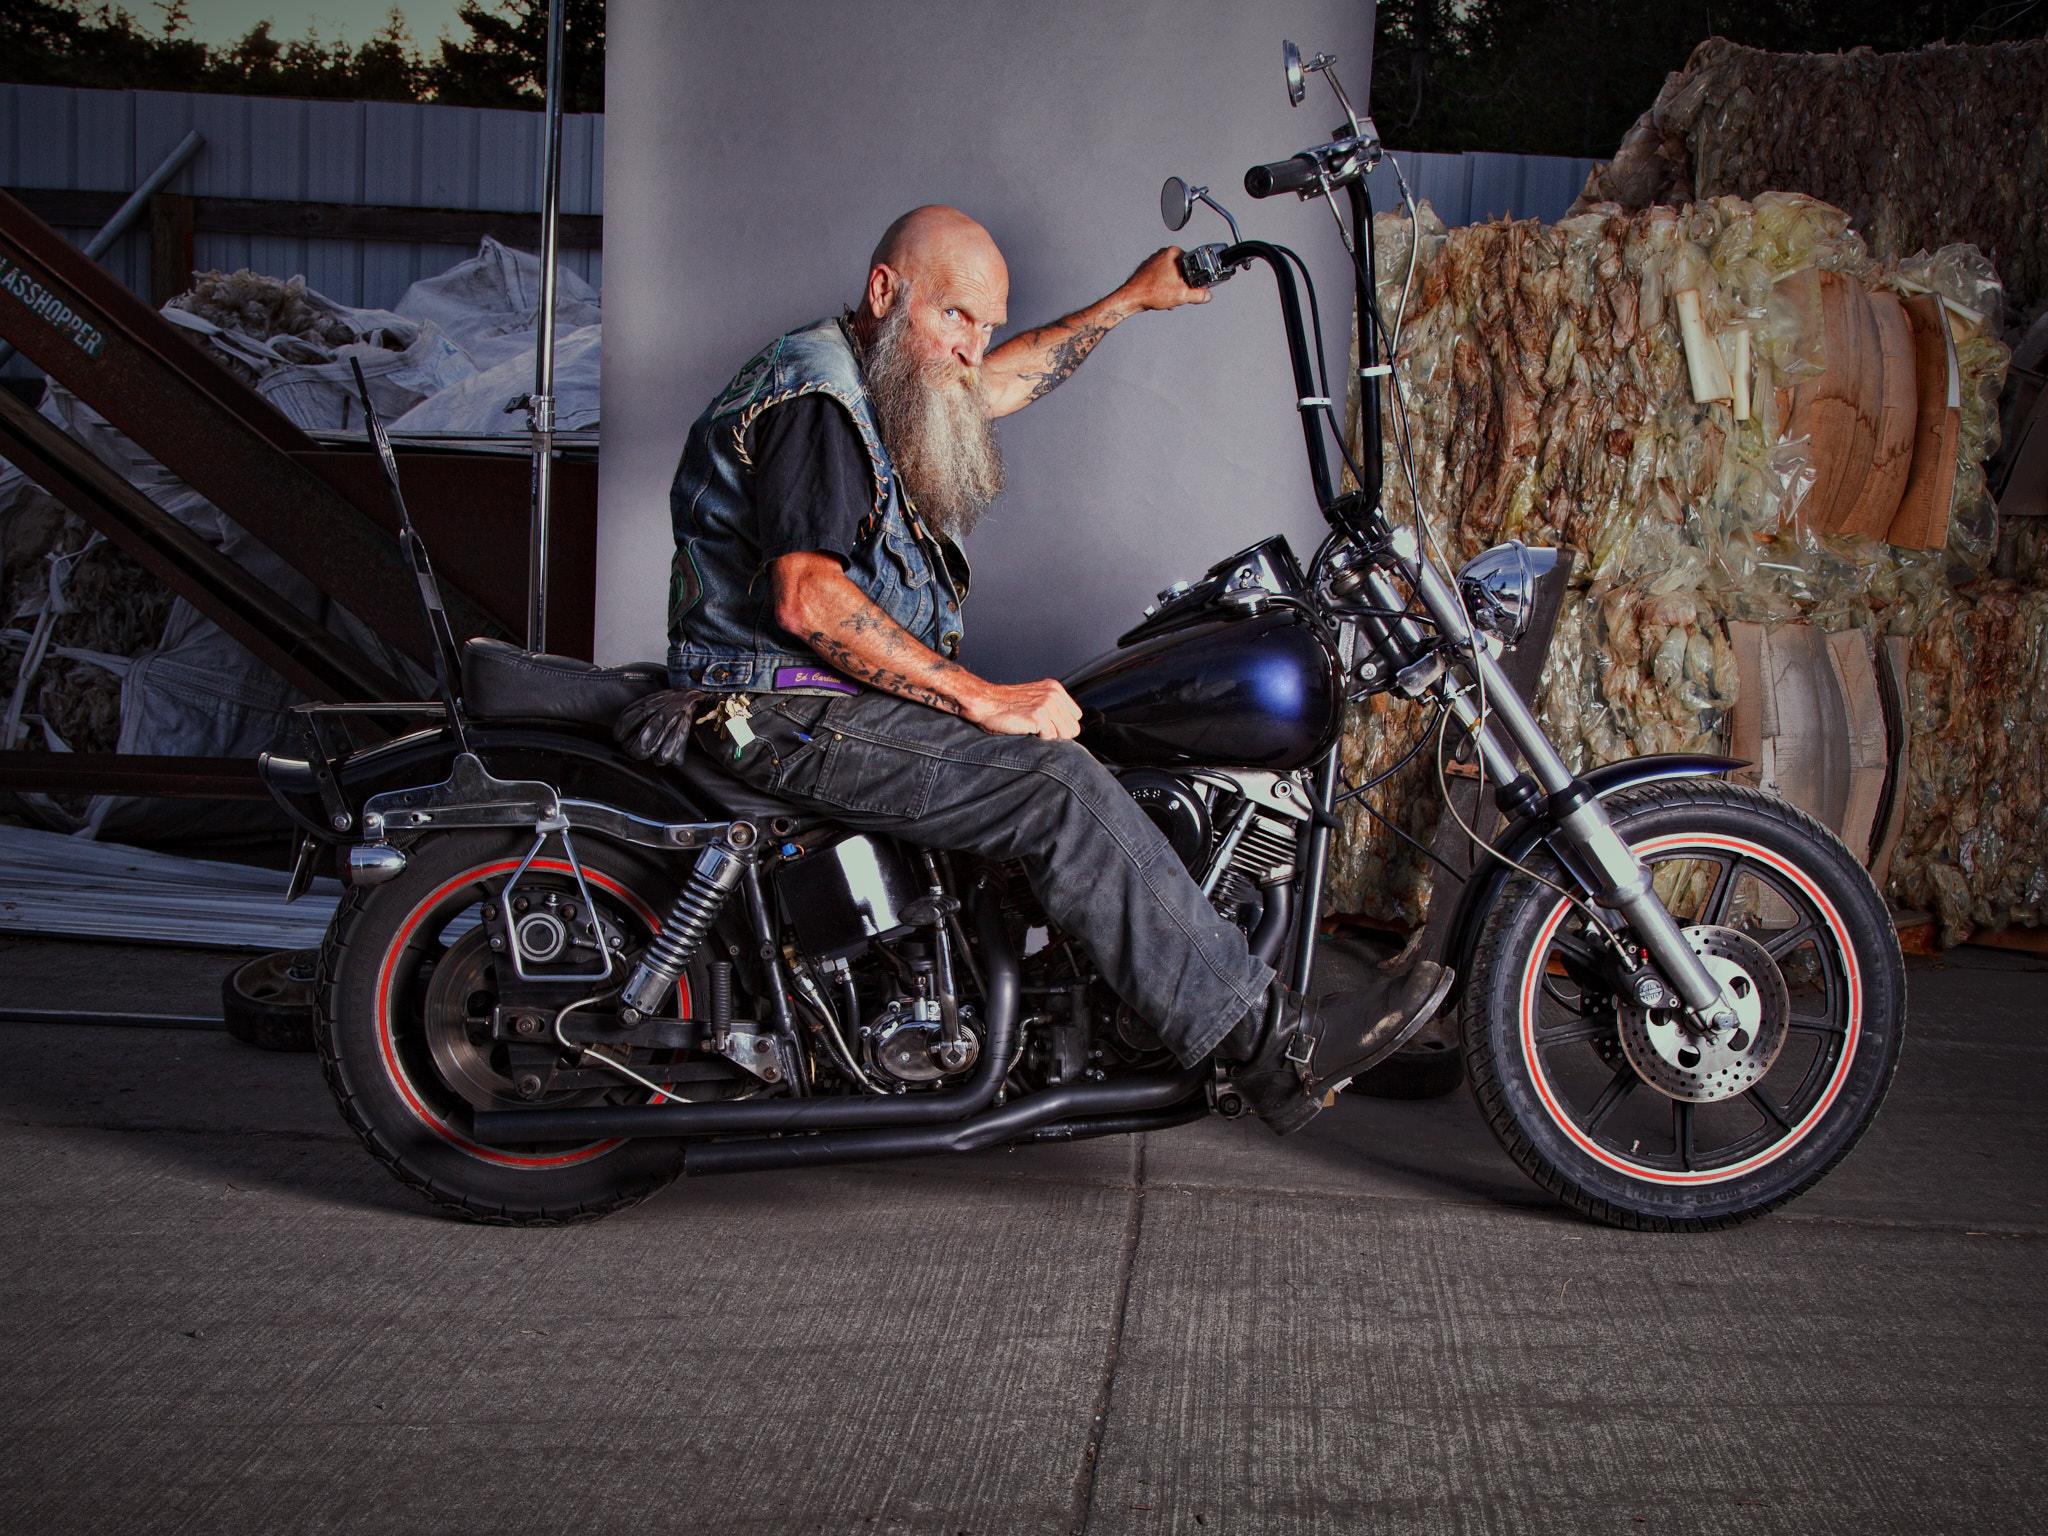 Motorcycle Dave on Motorcycle.jpg